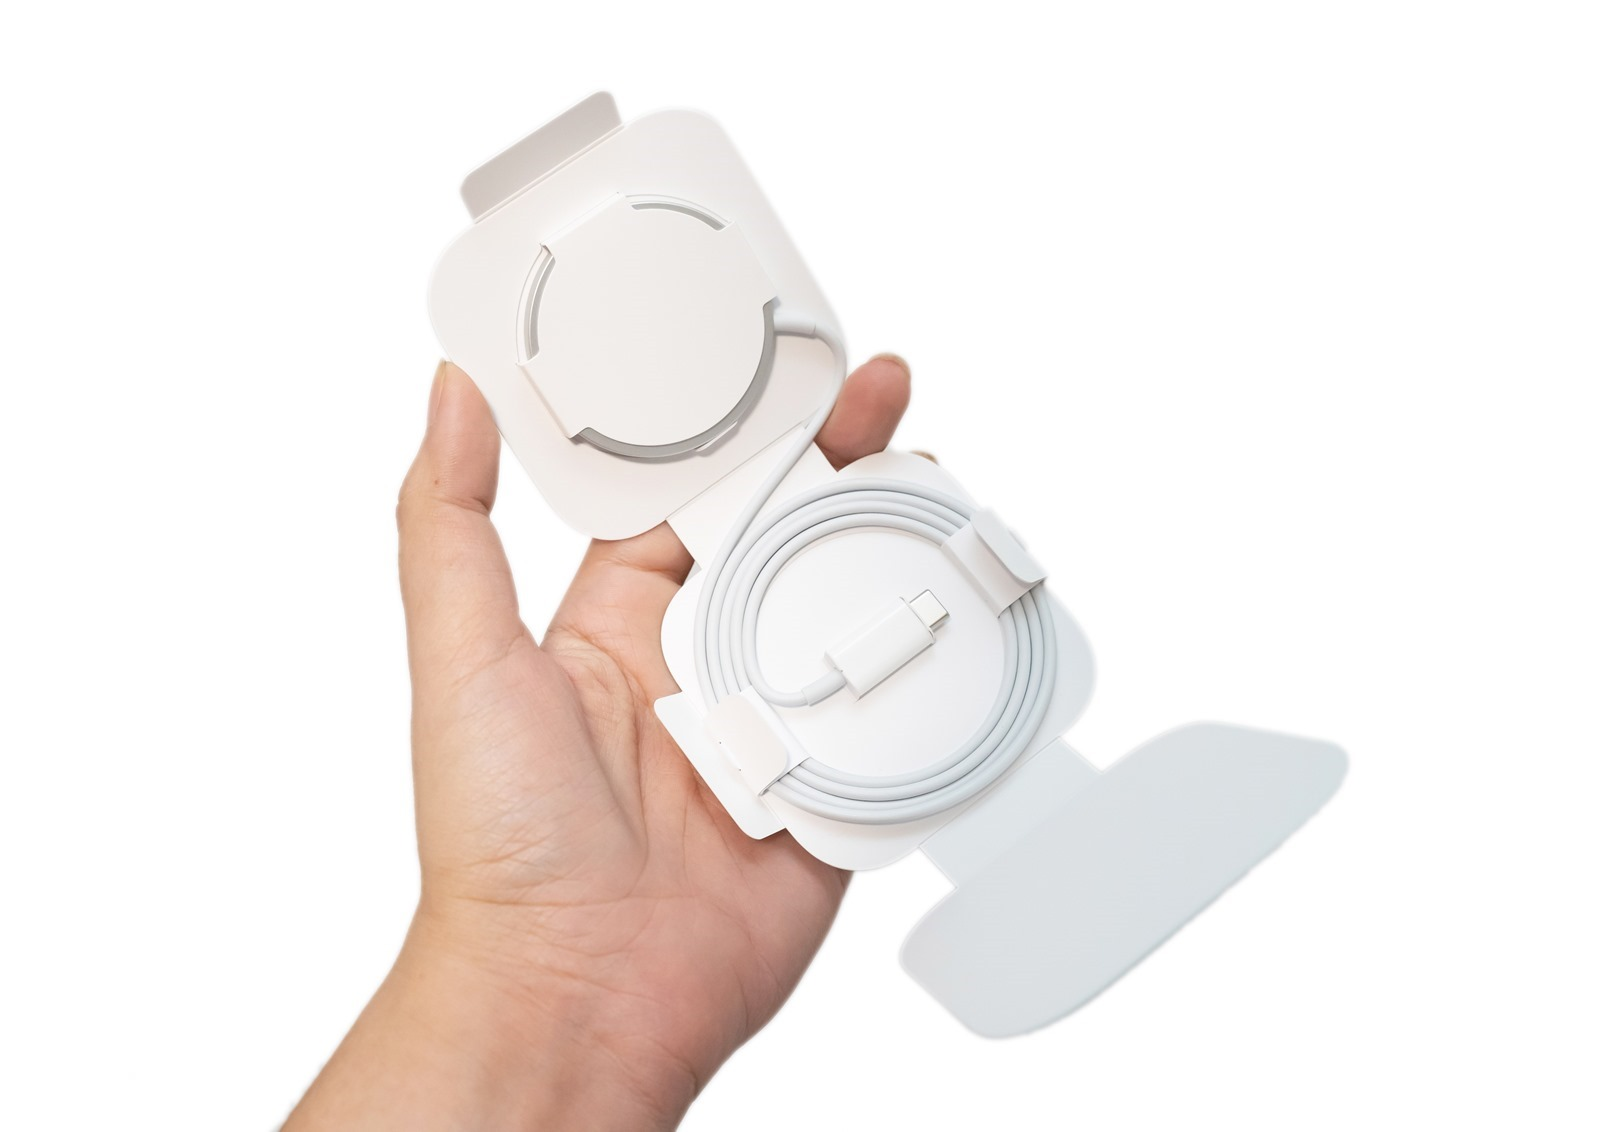 iPhone 12 充電實測 MagSafe 無線充電 / 一般無線充電 / 原廠 20W 快充 + MagSafe 開箱 @3C 達人廖阿輝